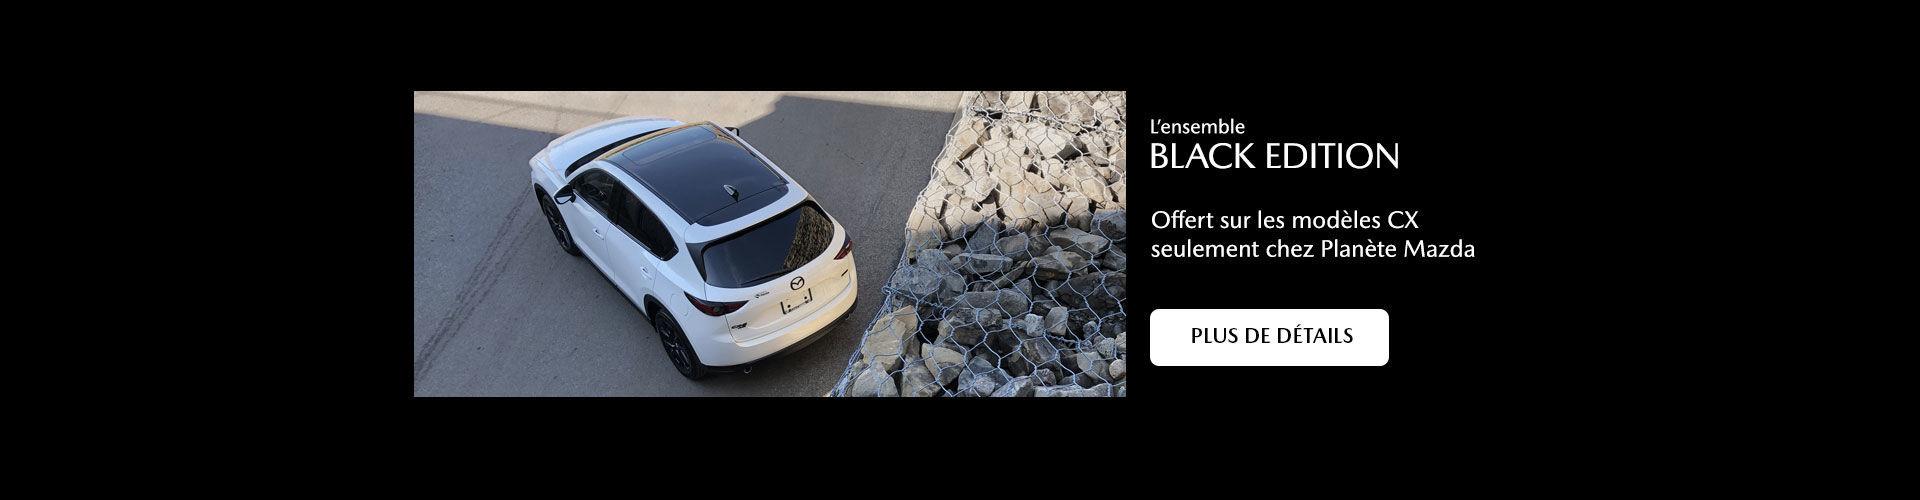 Planète Mazda Black Edition